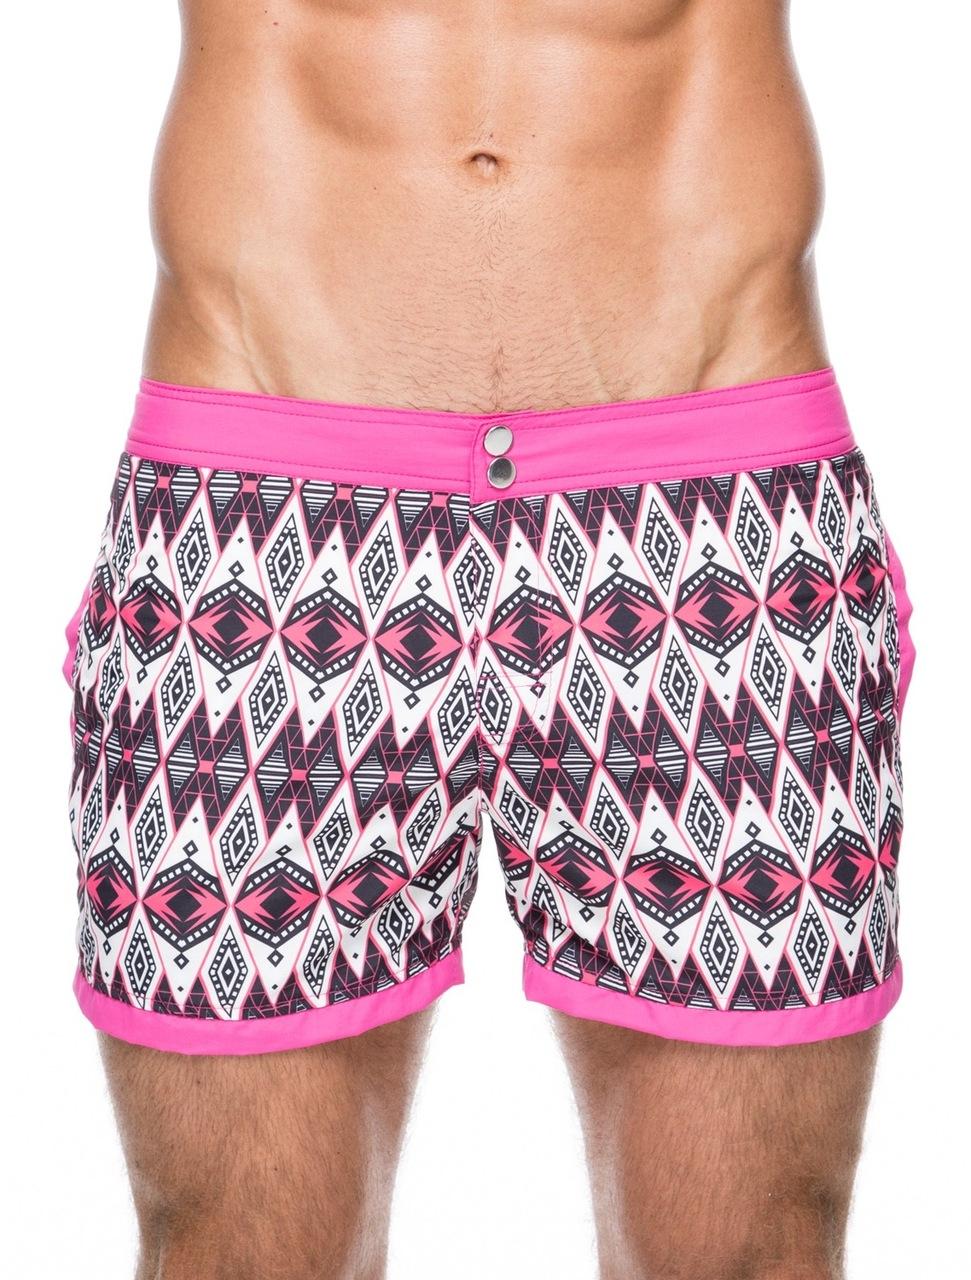 4f48c6ebaa Men's swim shorts - Front view of teamm8 Hunter short length honeysuckle pink  Swim shorts –